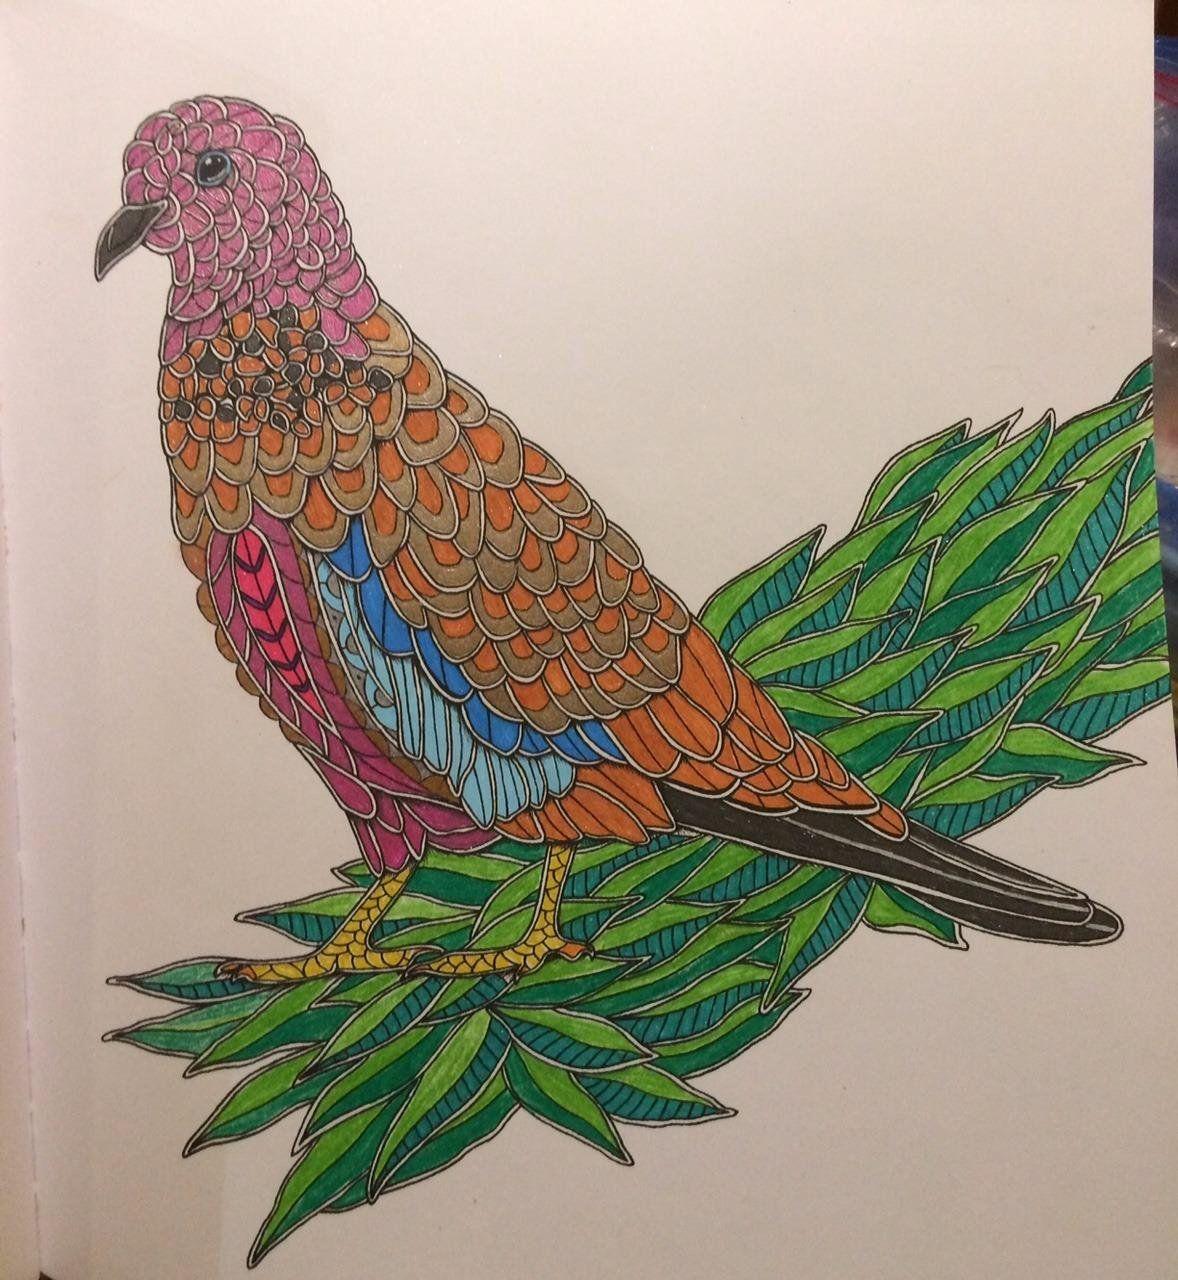 Robot Check Coloring Books Birds Color